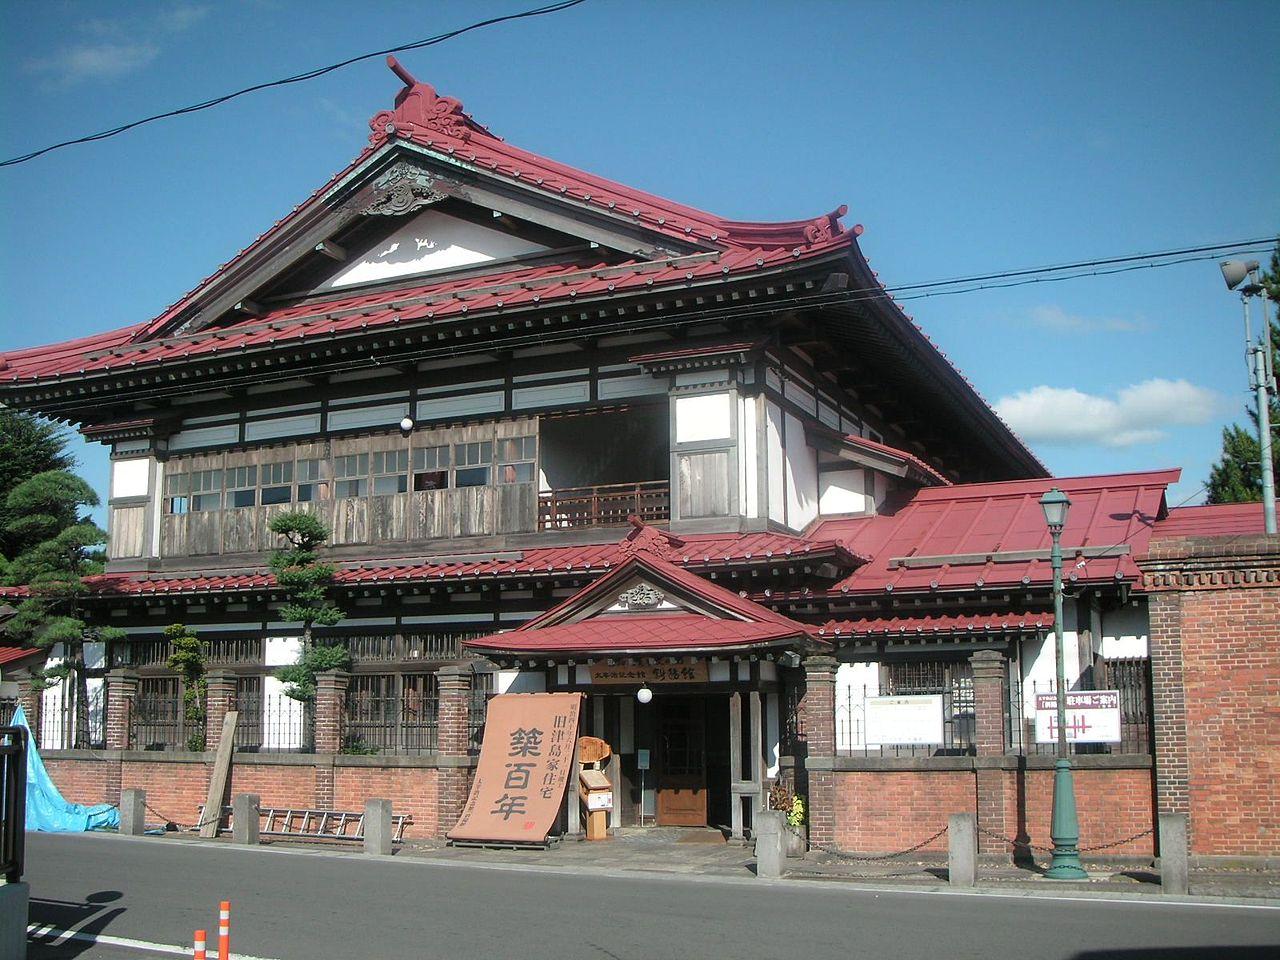 1280px-Shayokan_Osamu_Dazai_Memorial_Hall.jpg